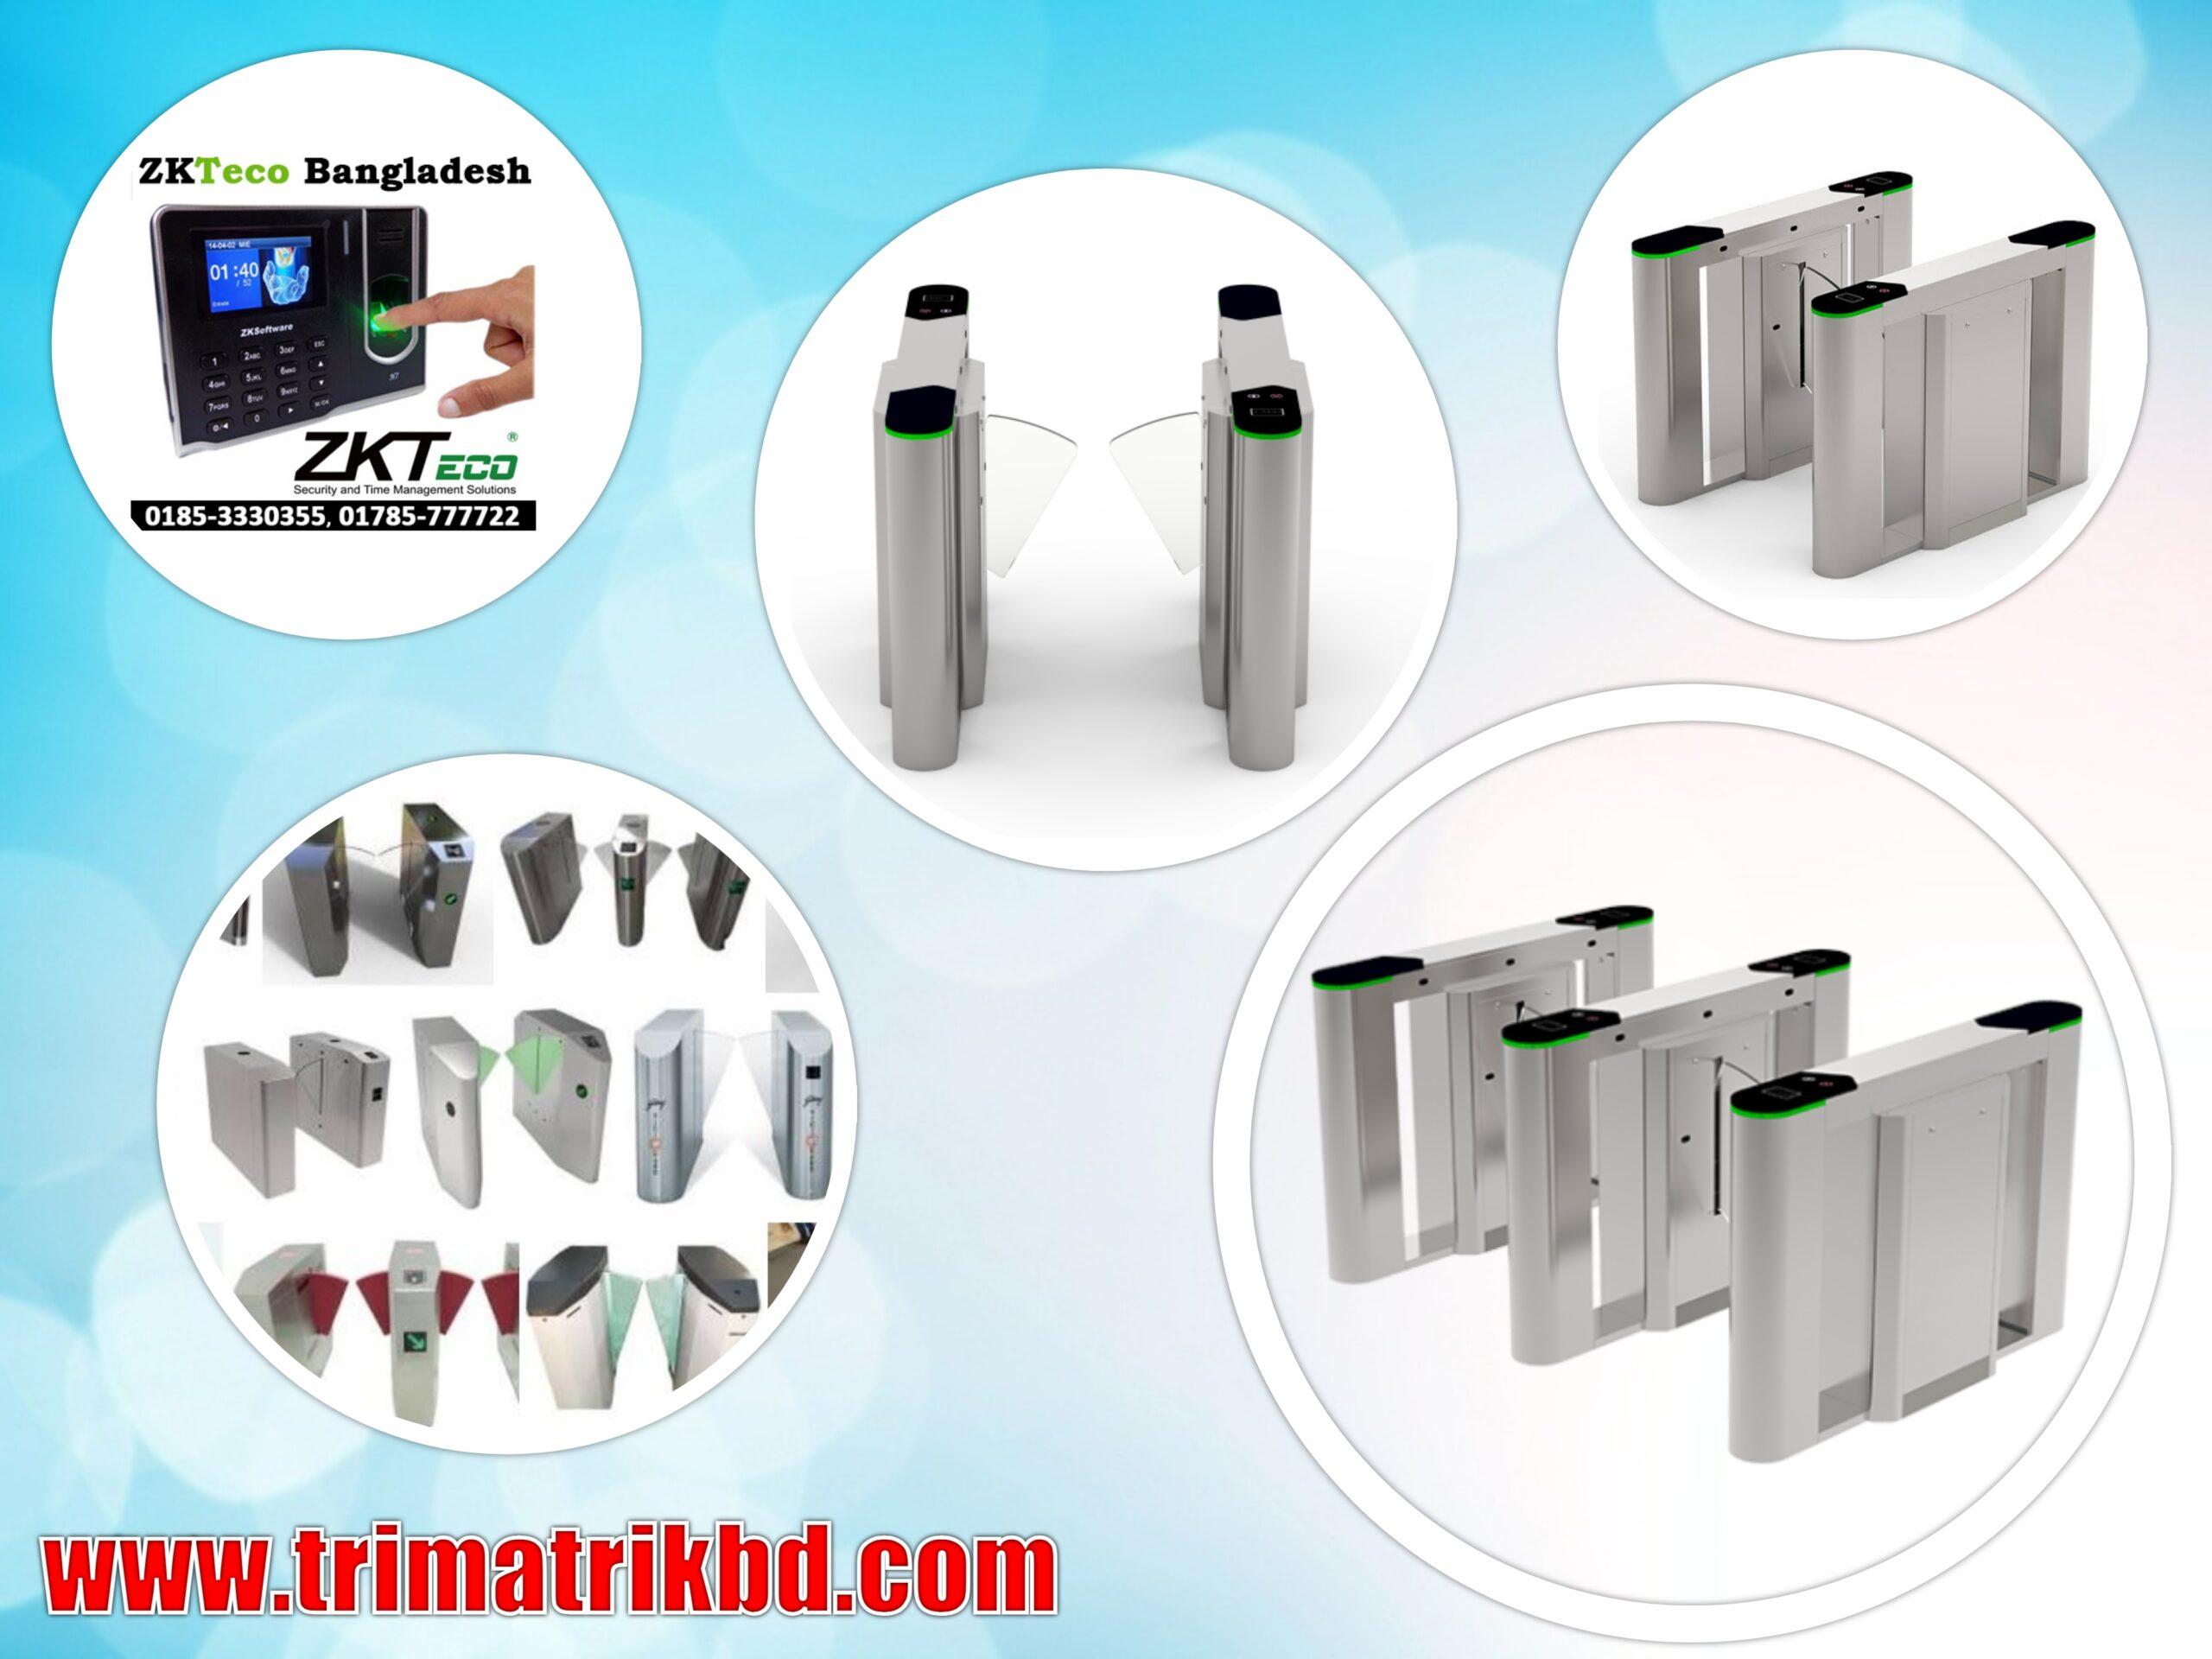 ZKTeco FBL6000 Pro Bangladesh, ZKTeco FBL6000 Pro Price in BD